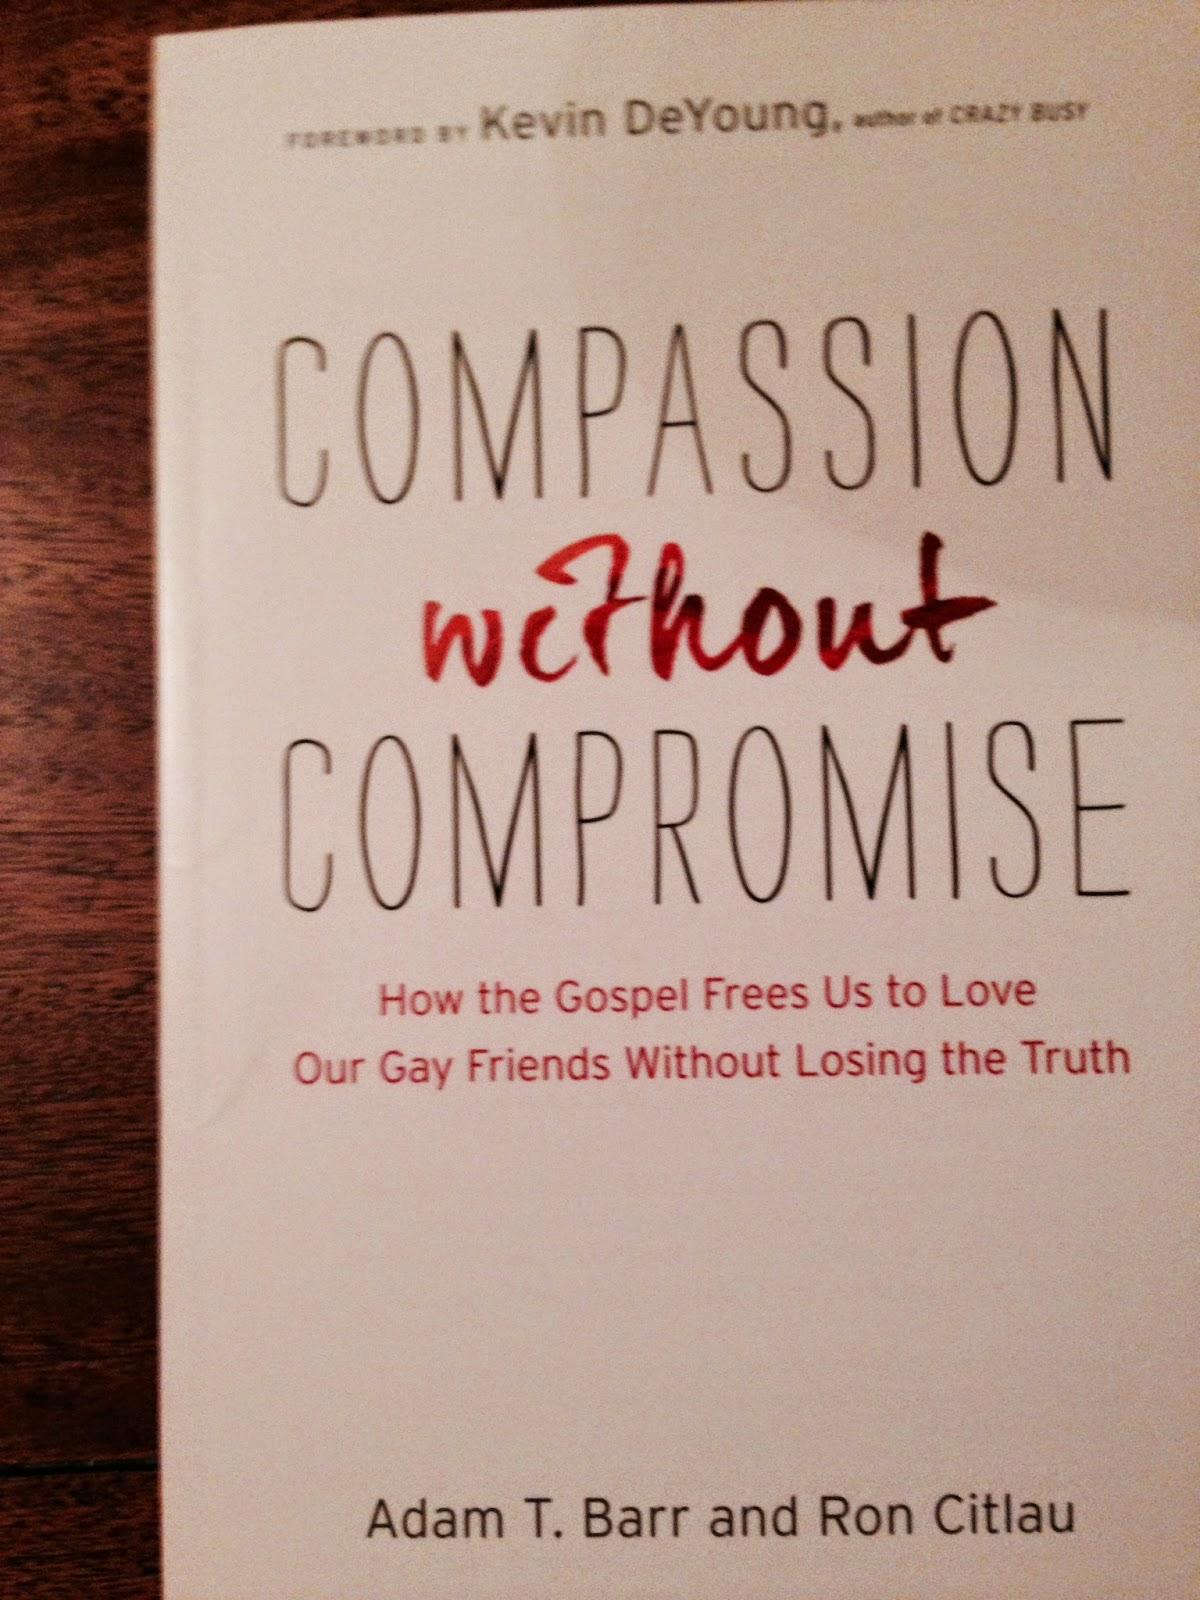 gospel-frees-us-to-love